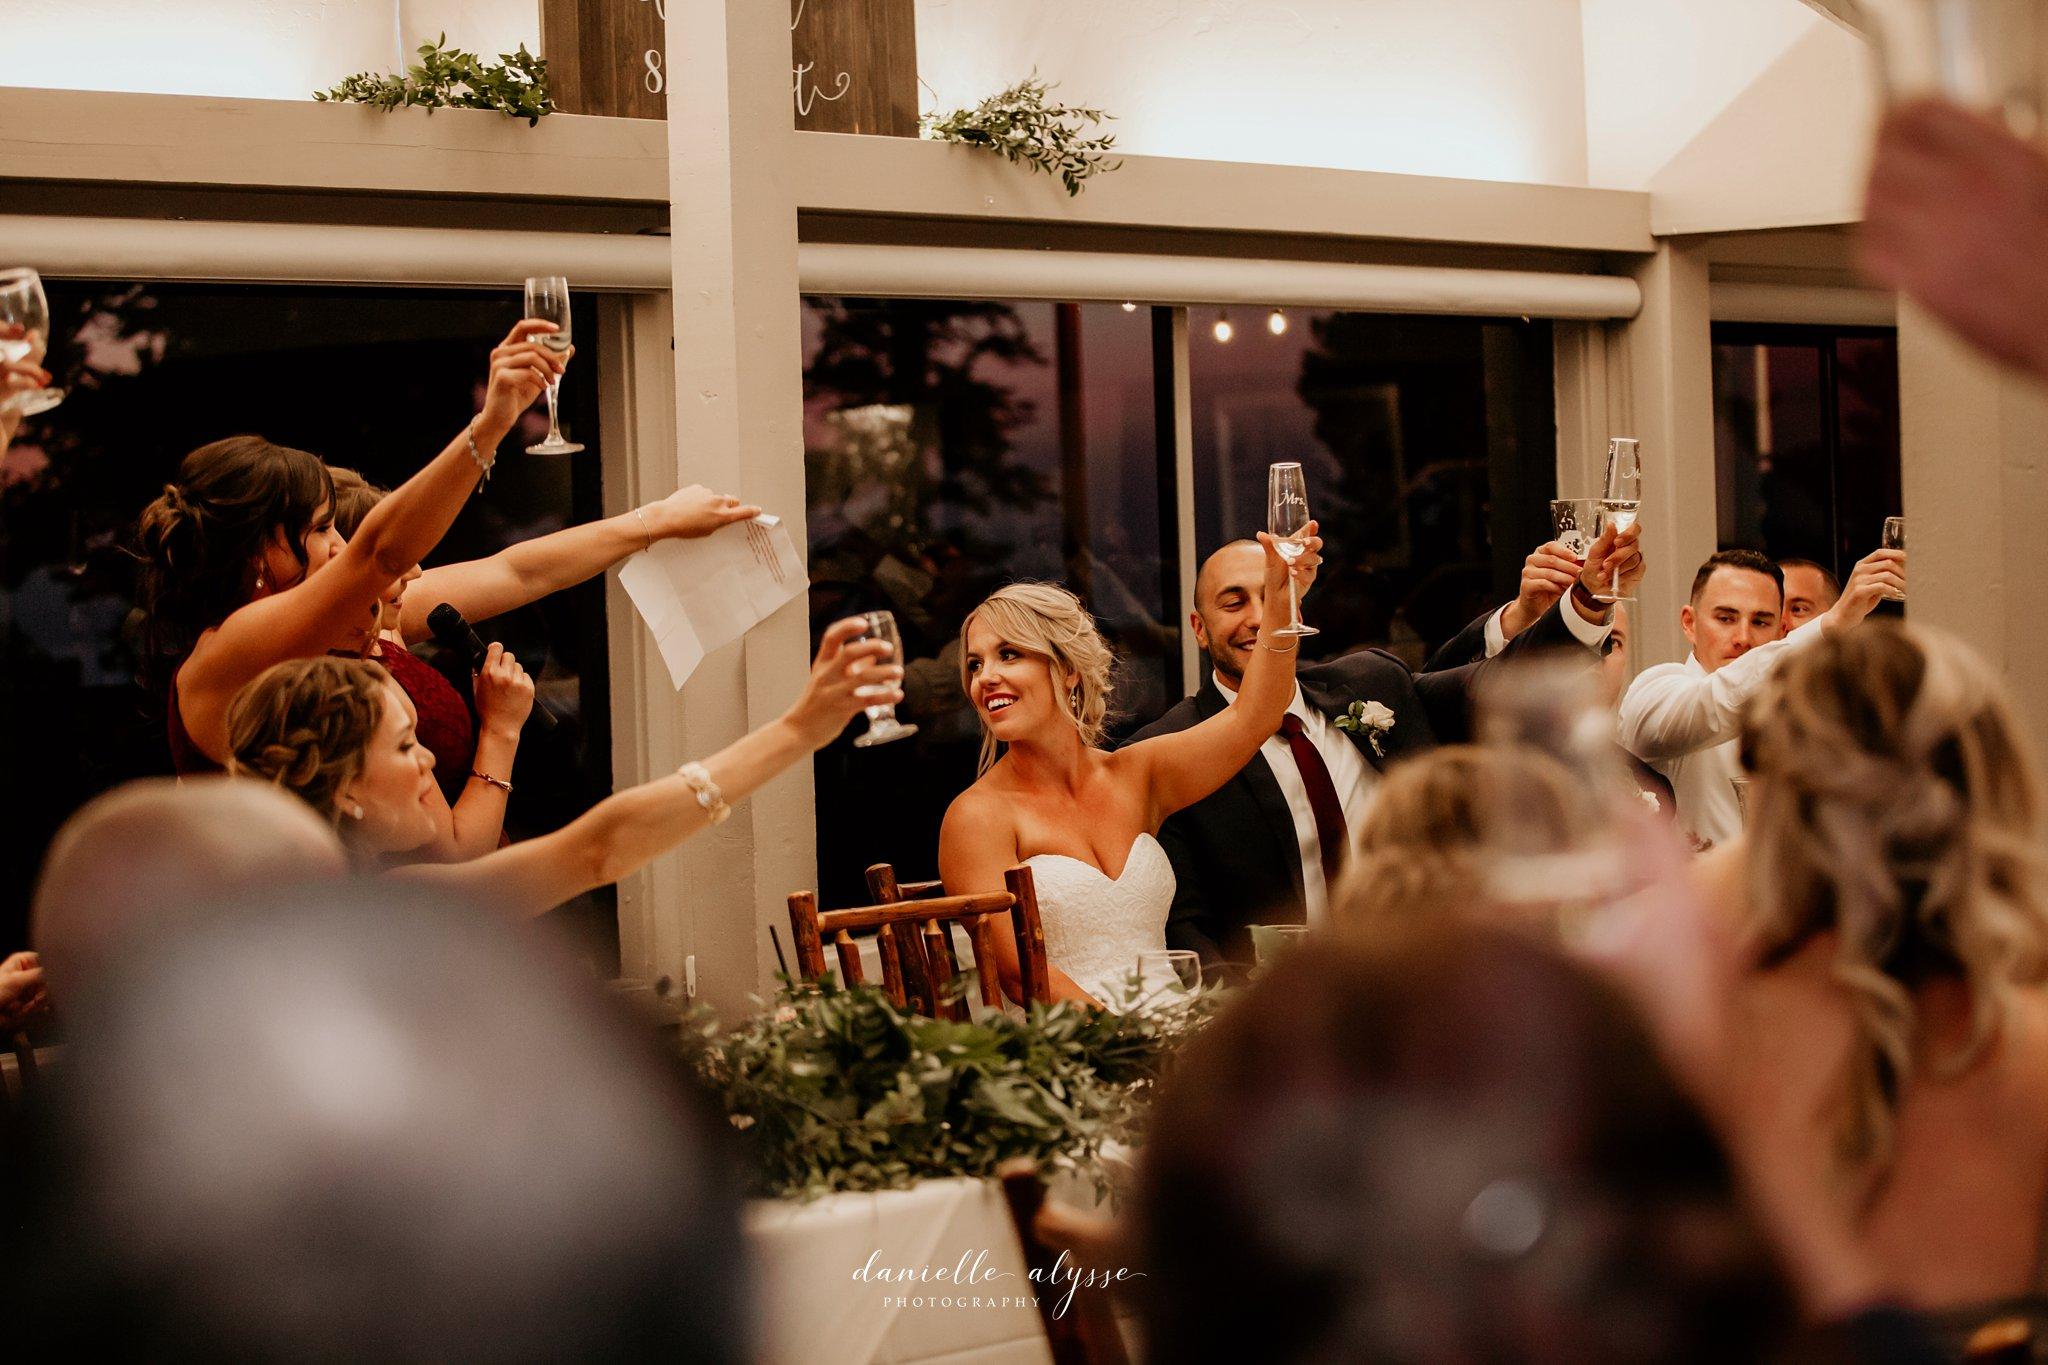 180831_wedding_stephanie_heavenly_south_lake_tahoe_danielle_alysse_photography_destination_blog_1136_WEB.jpg